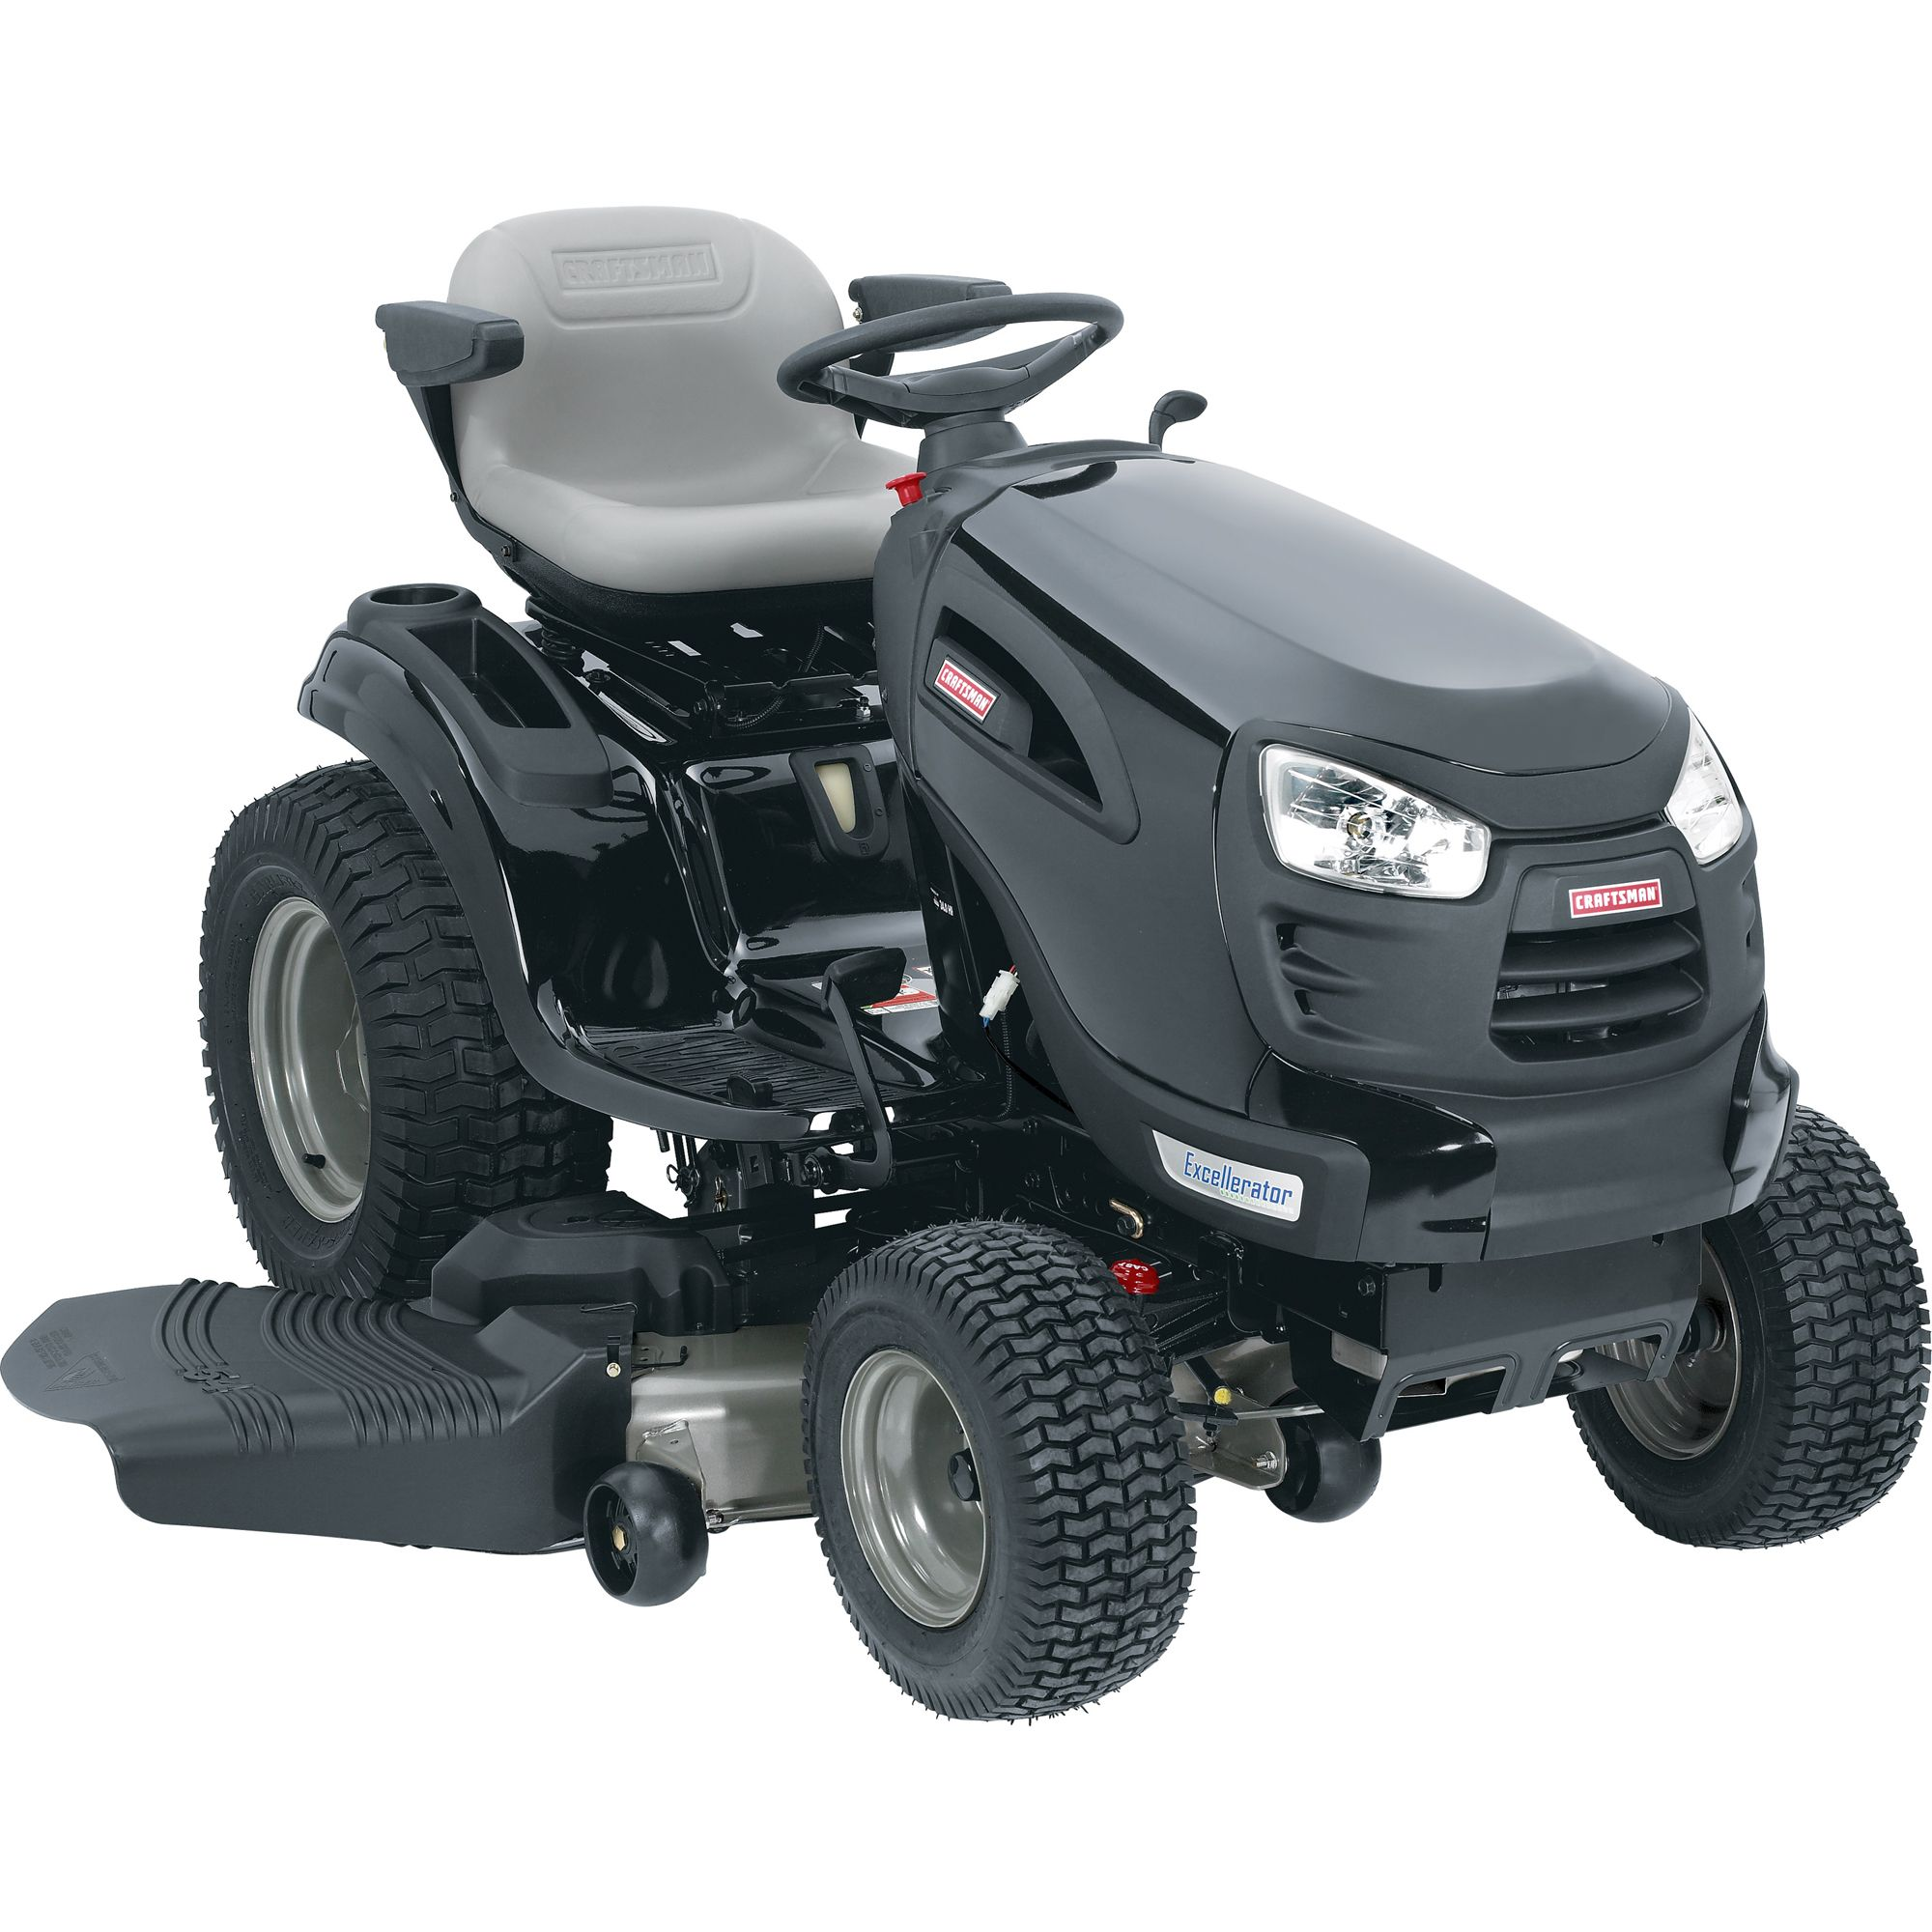 craftsman 28947 gt 5000 54 kohler 26 hp gas powered riding garden tractor [ 2000 x 2000 Pixel ]